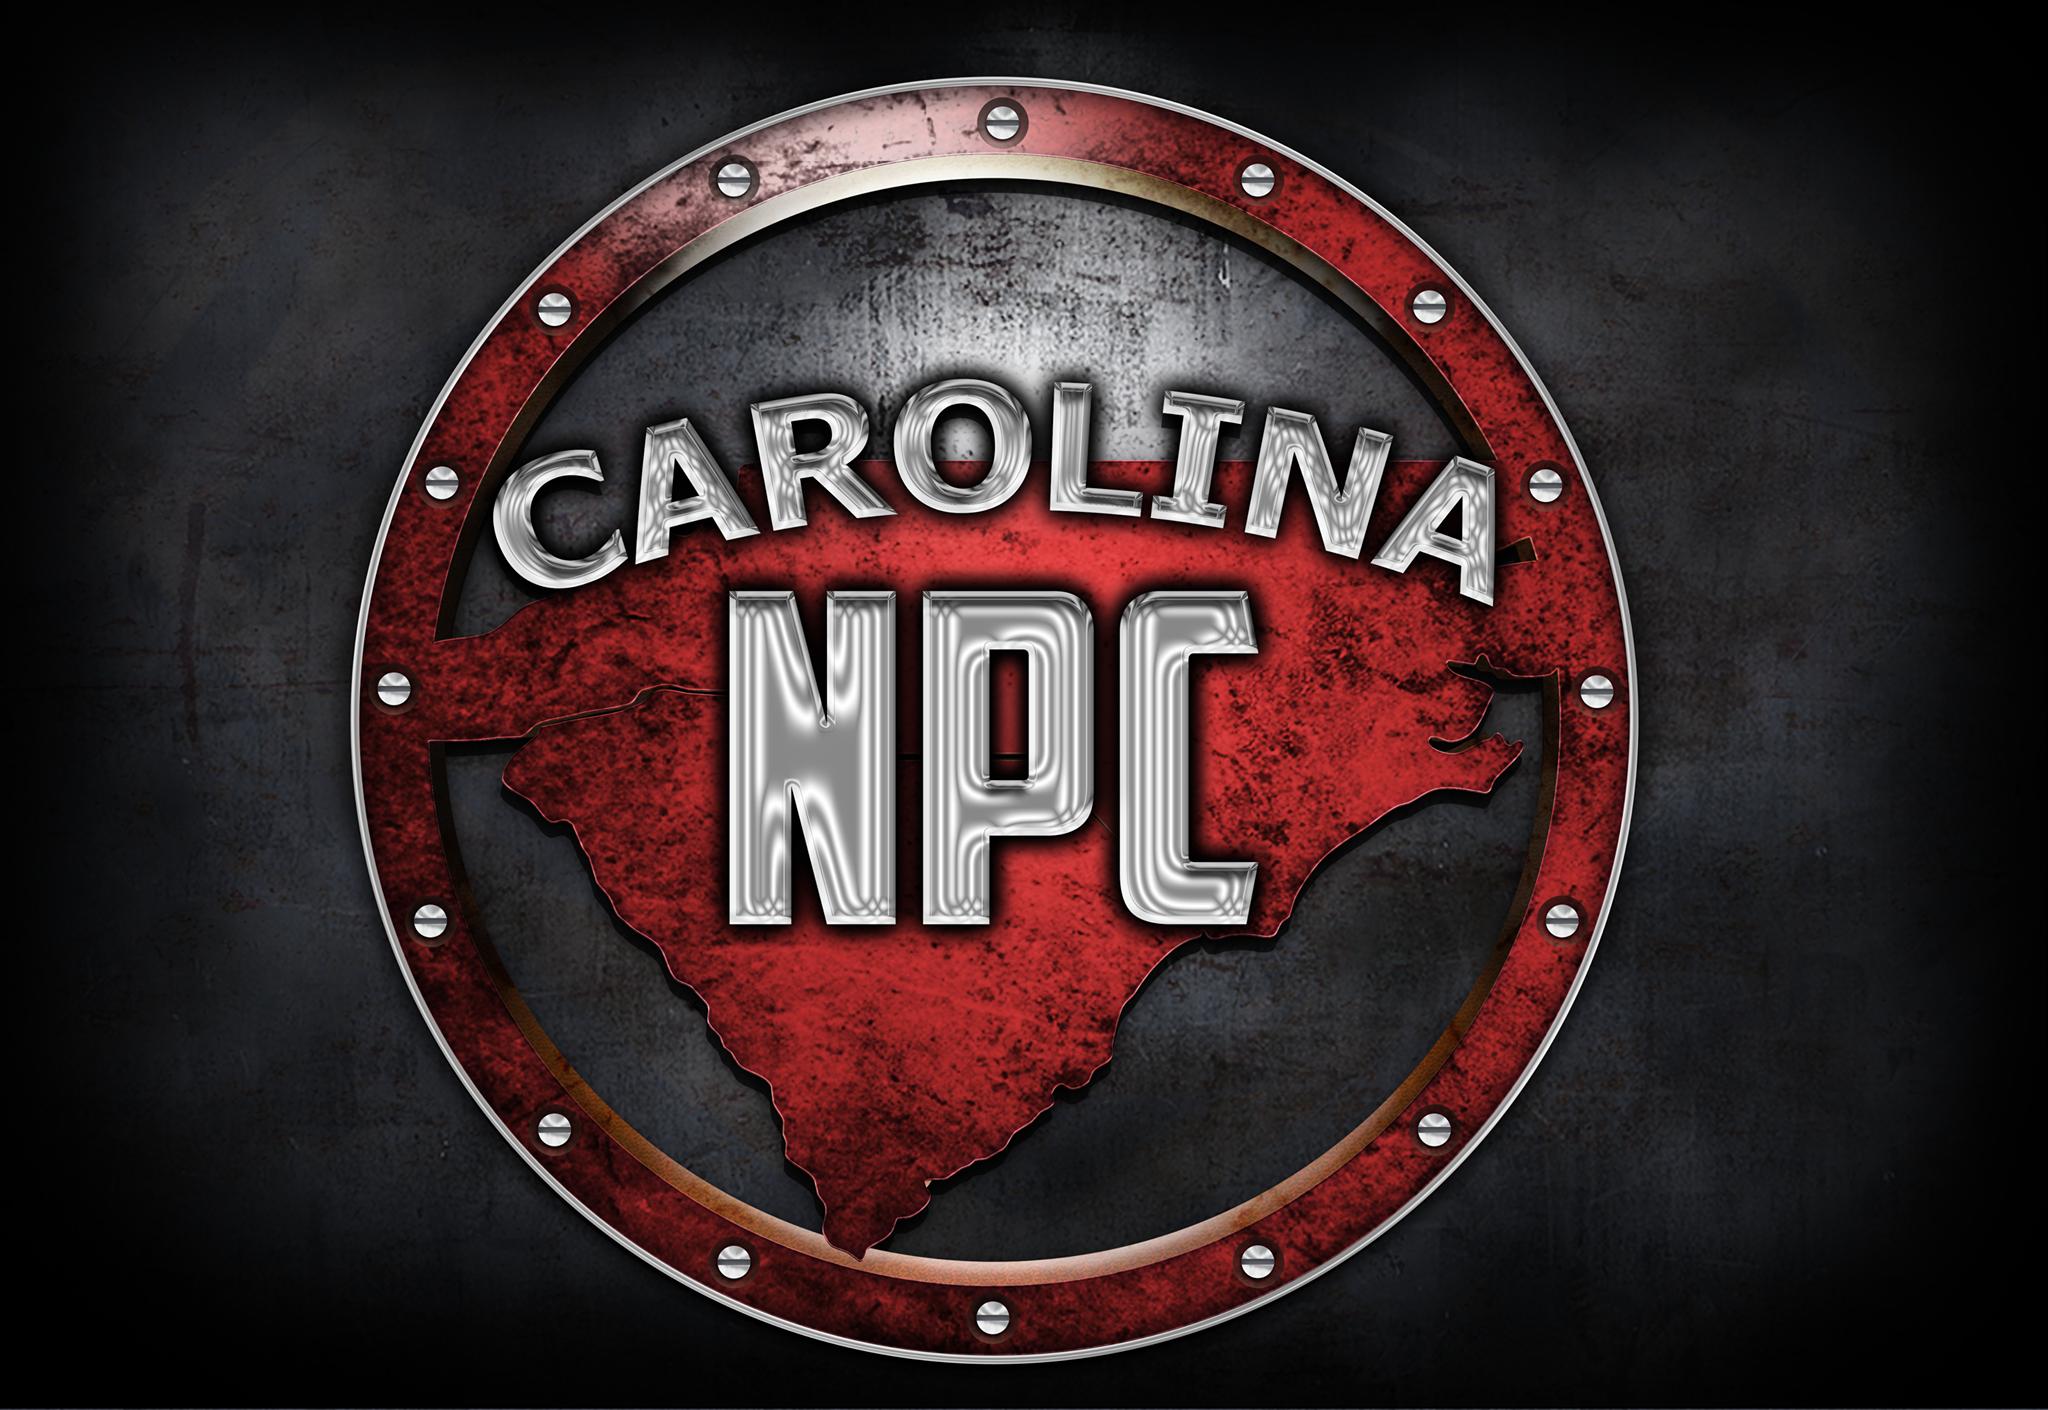 Carolina NPC